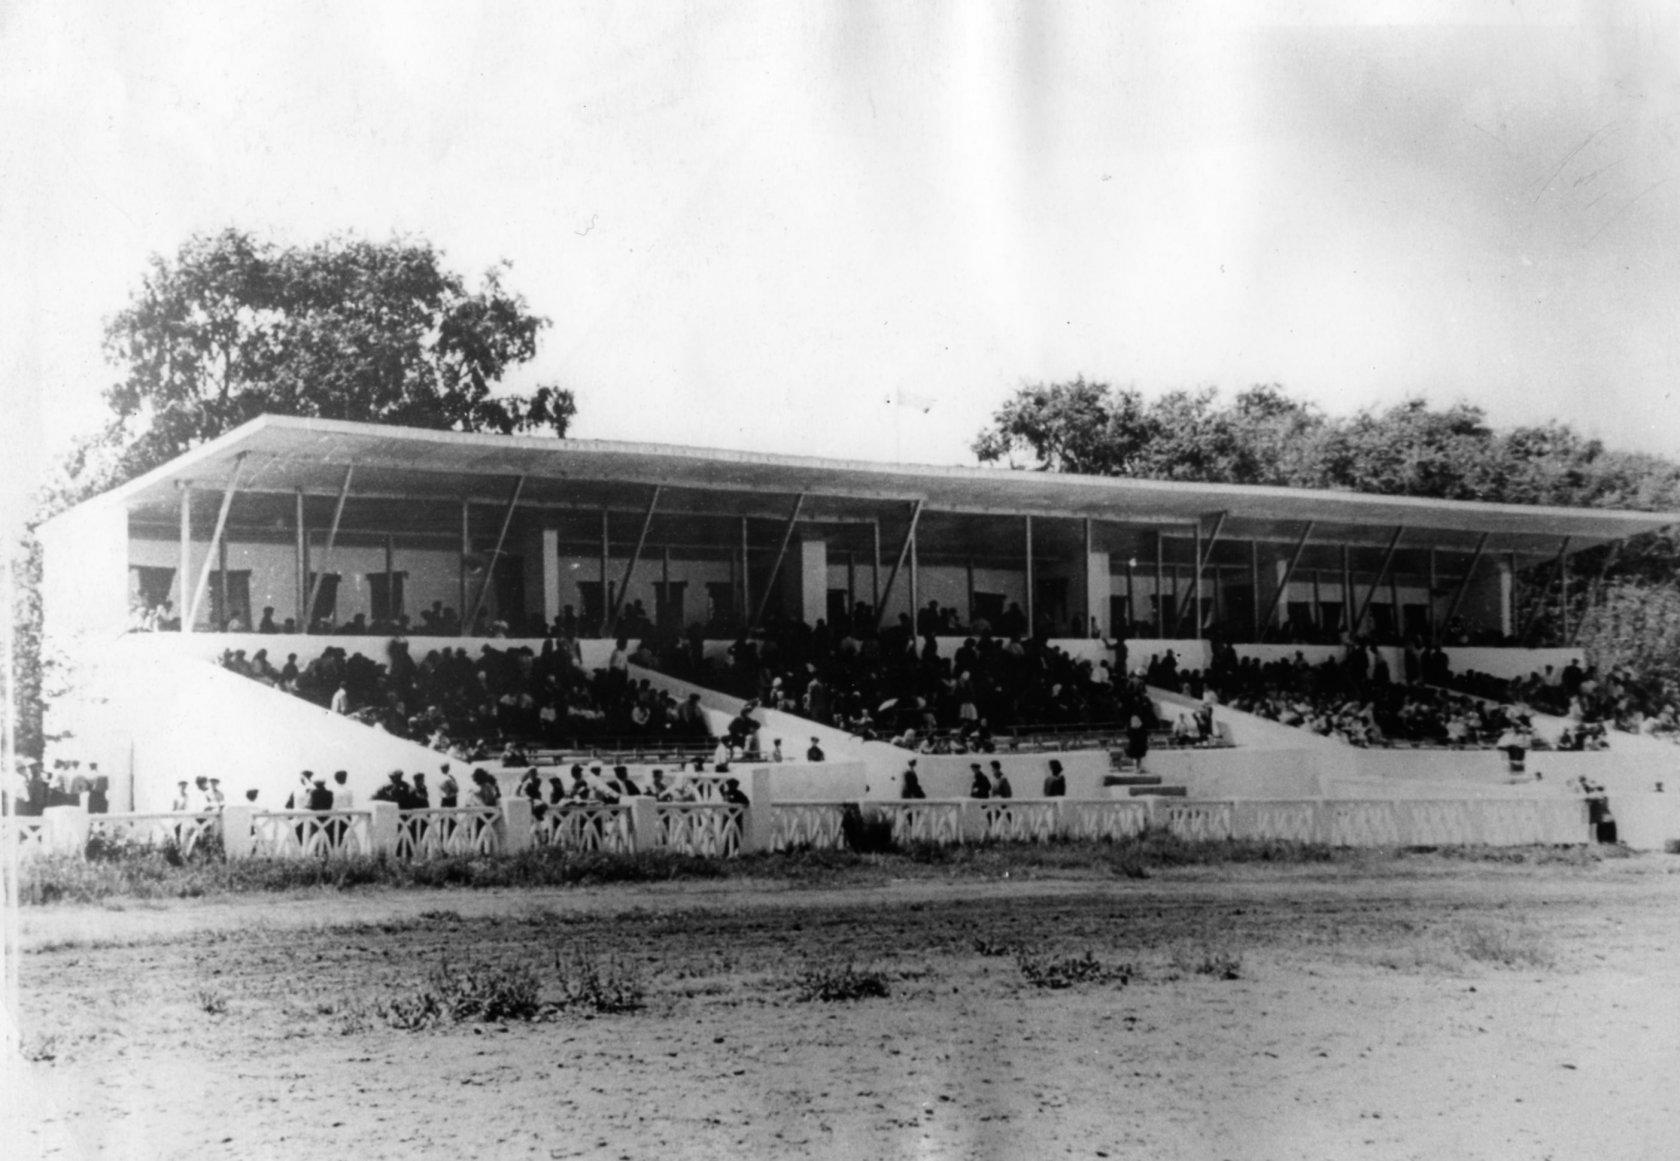 Rostrum of the city hippodrome, 1968.